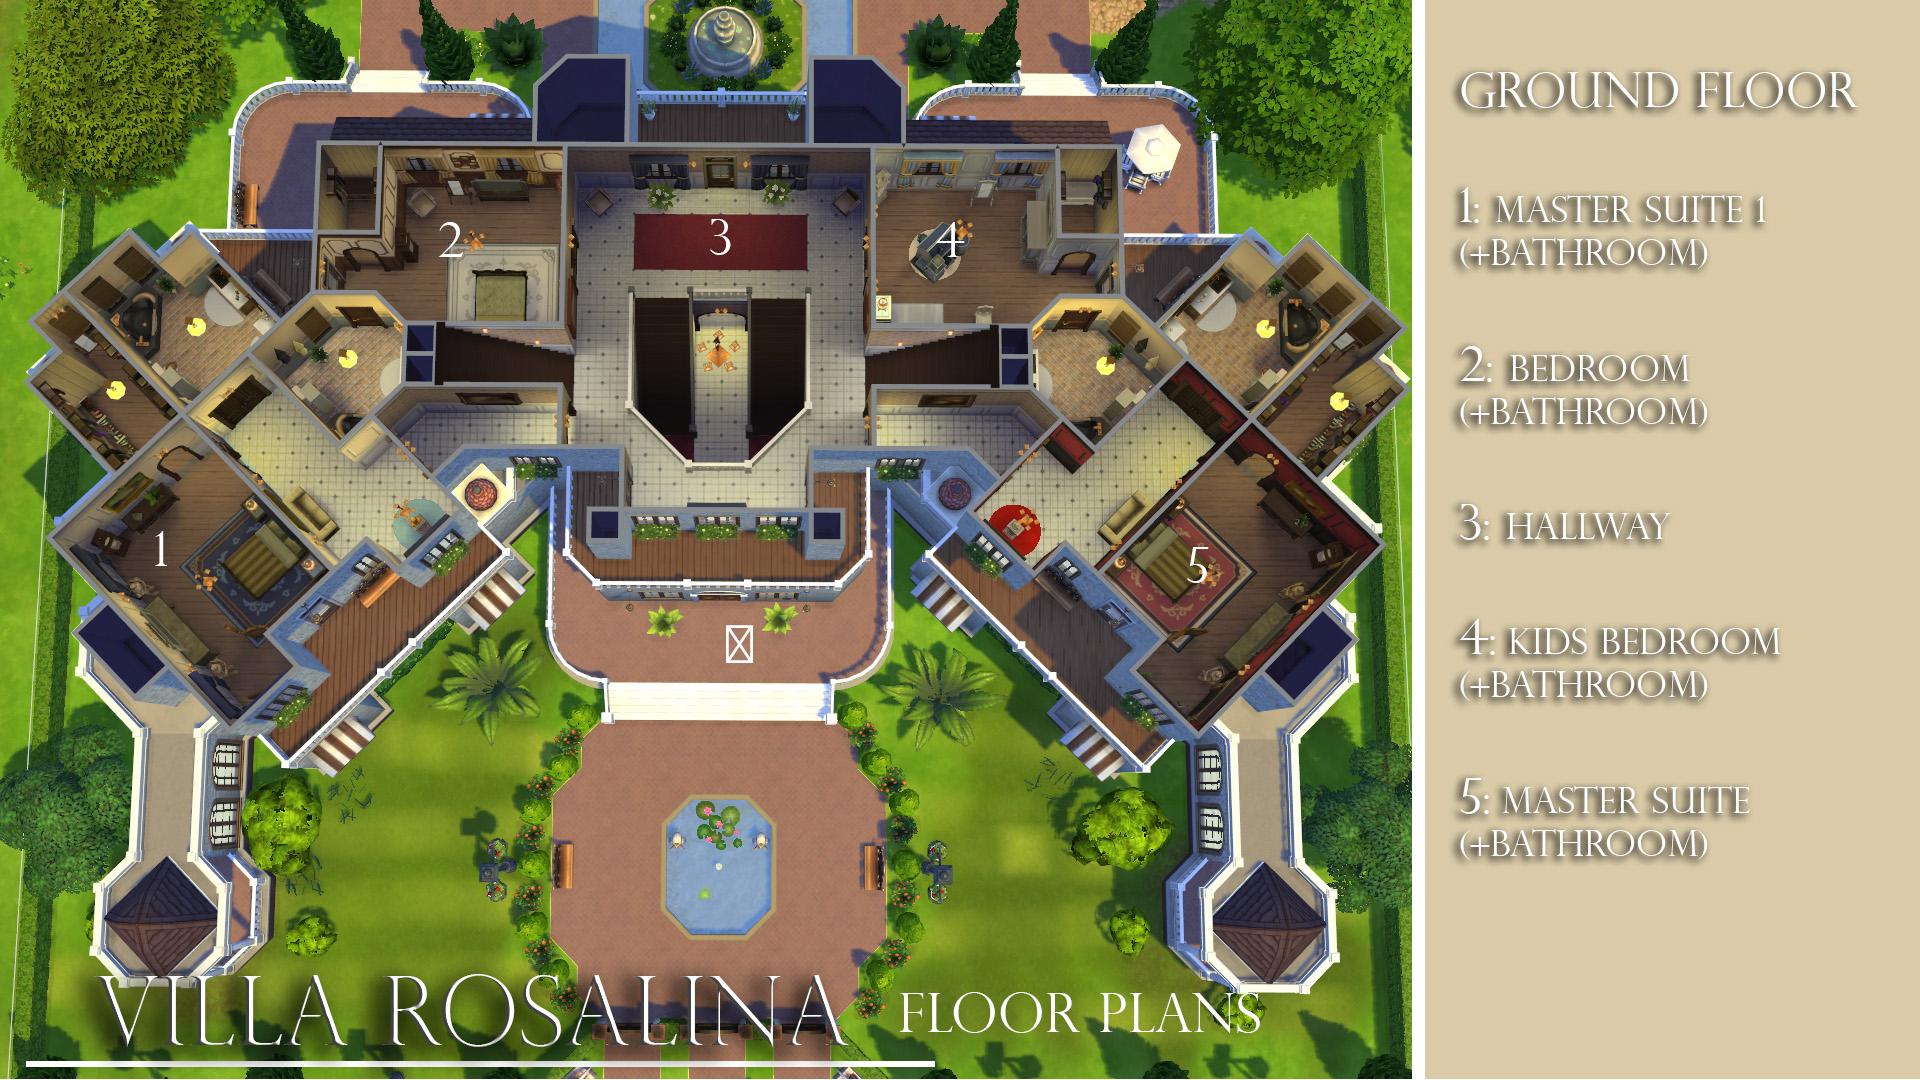 Mod the sims villa rosalina no cc for Sims 4 floor plans